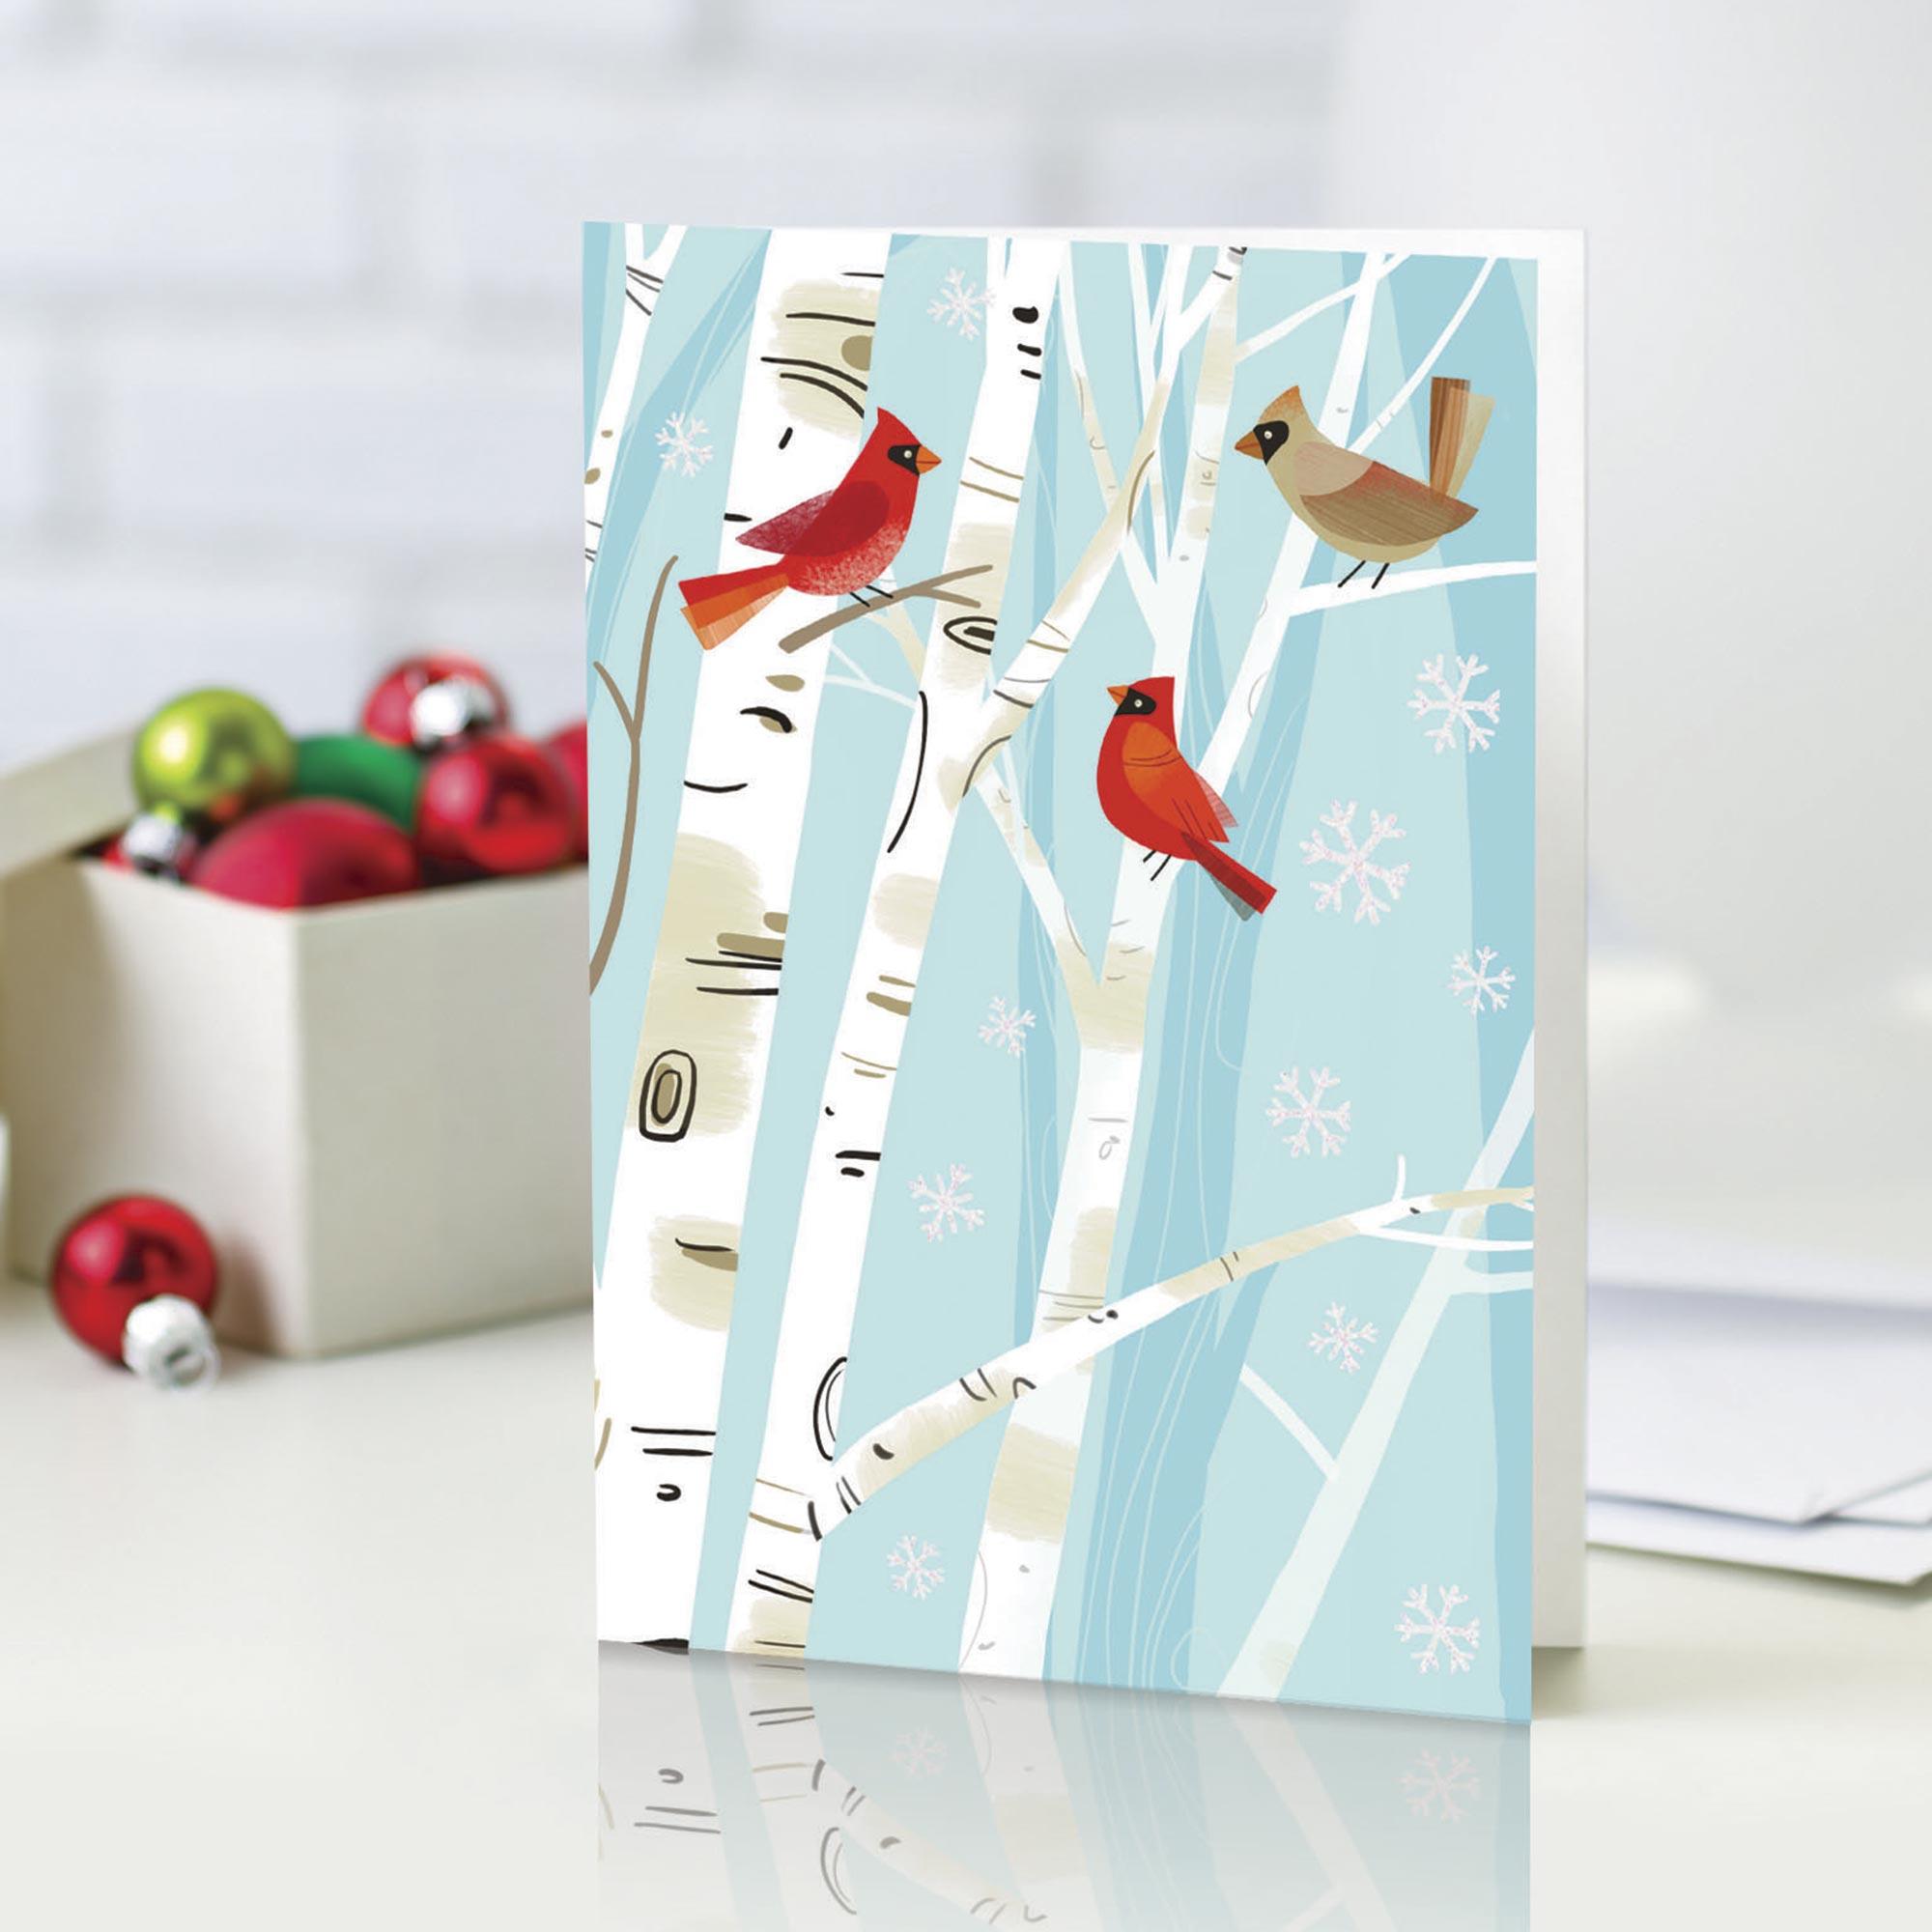 Unicef Market Unicef Holiday Cards Boxed Set Of 12 The Cardinals